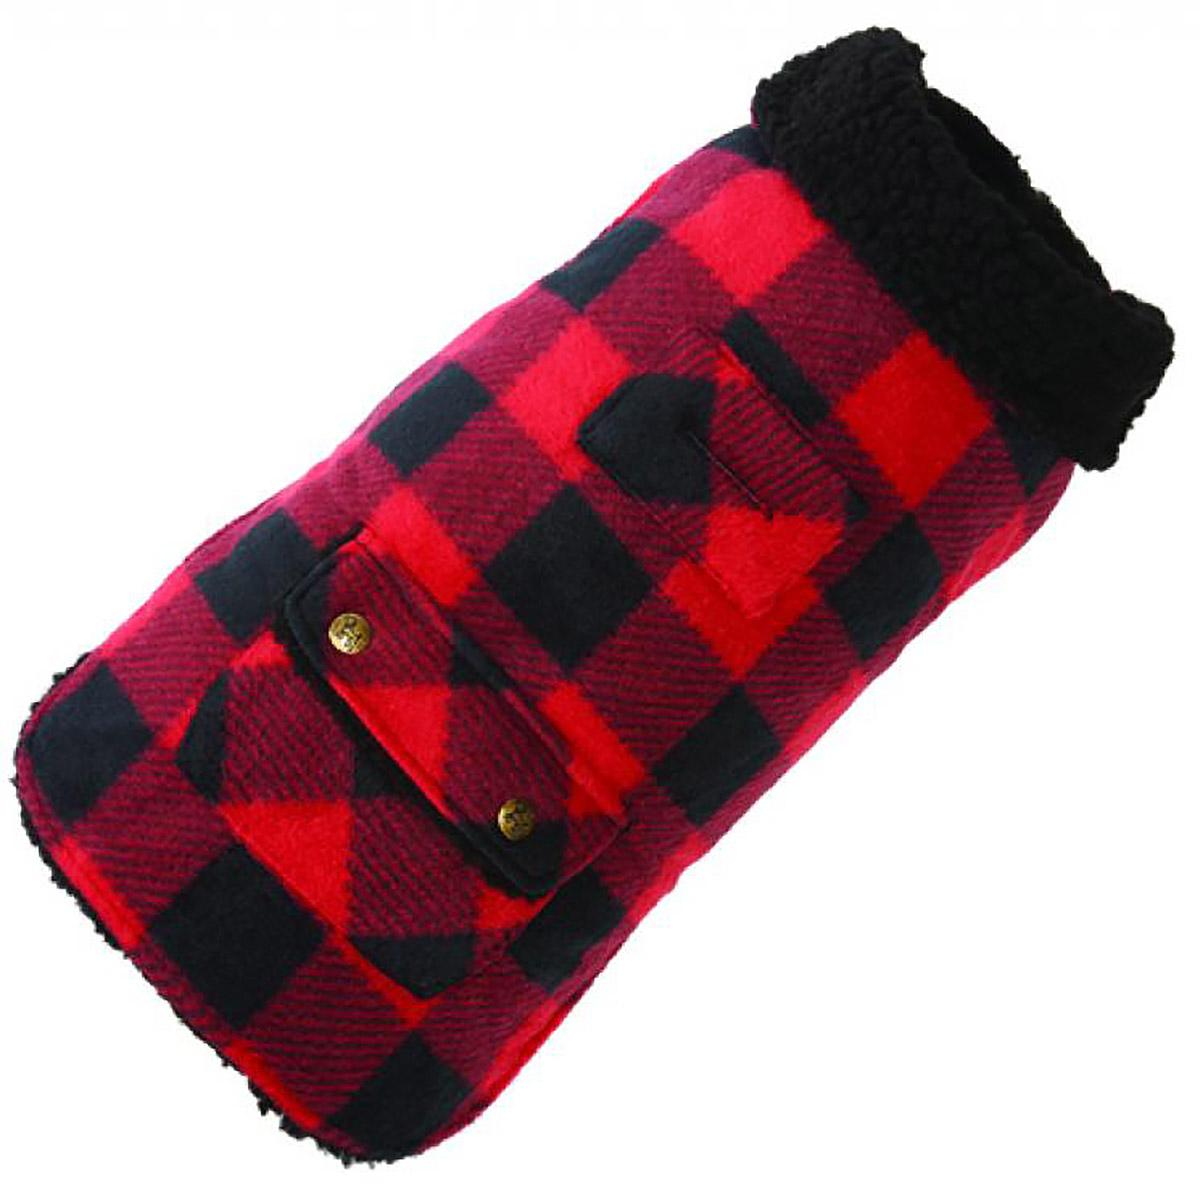 Buffalo Check Fleece Dog Coat by Up Country